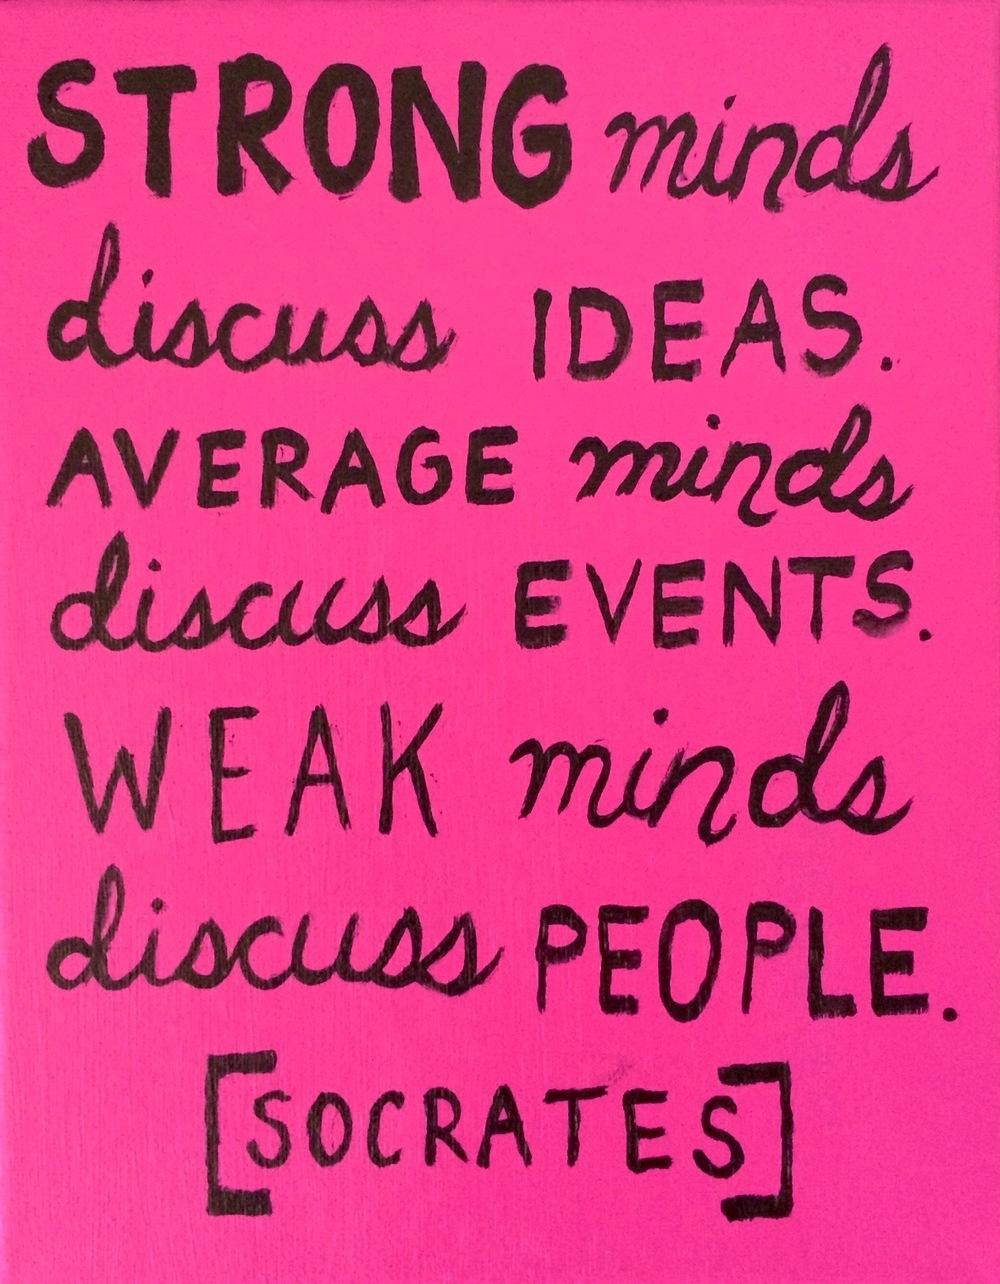 Quote Socrates.jpg